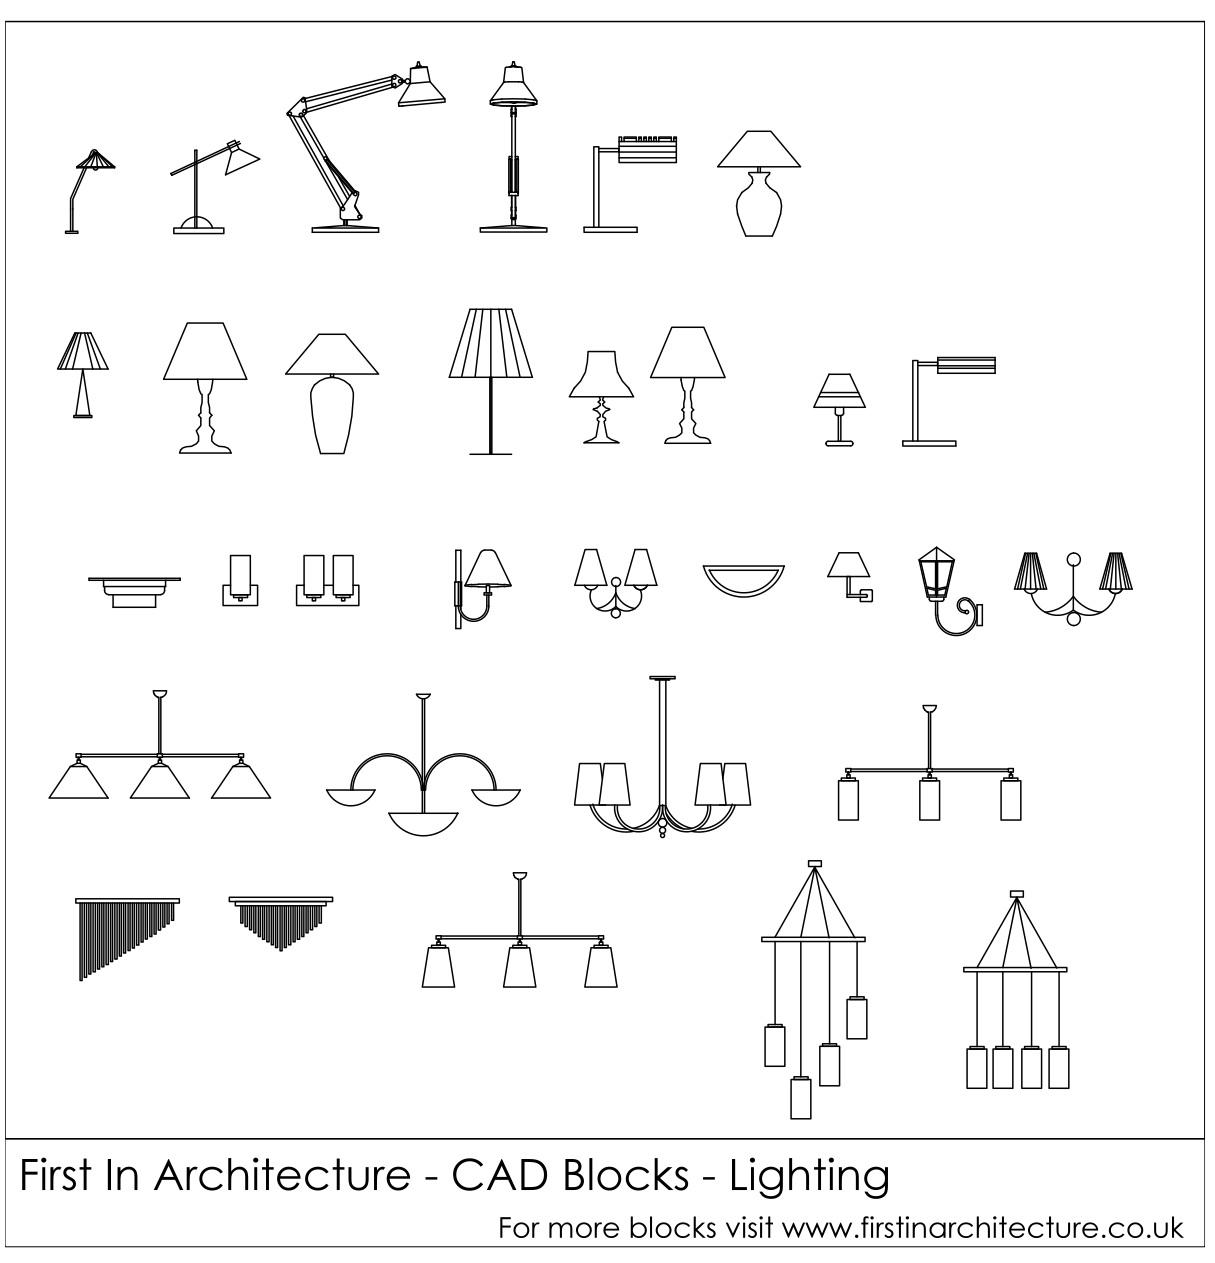 Lighting cad blocks